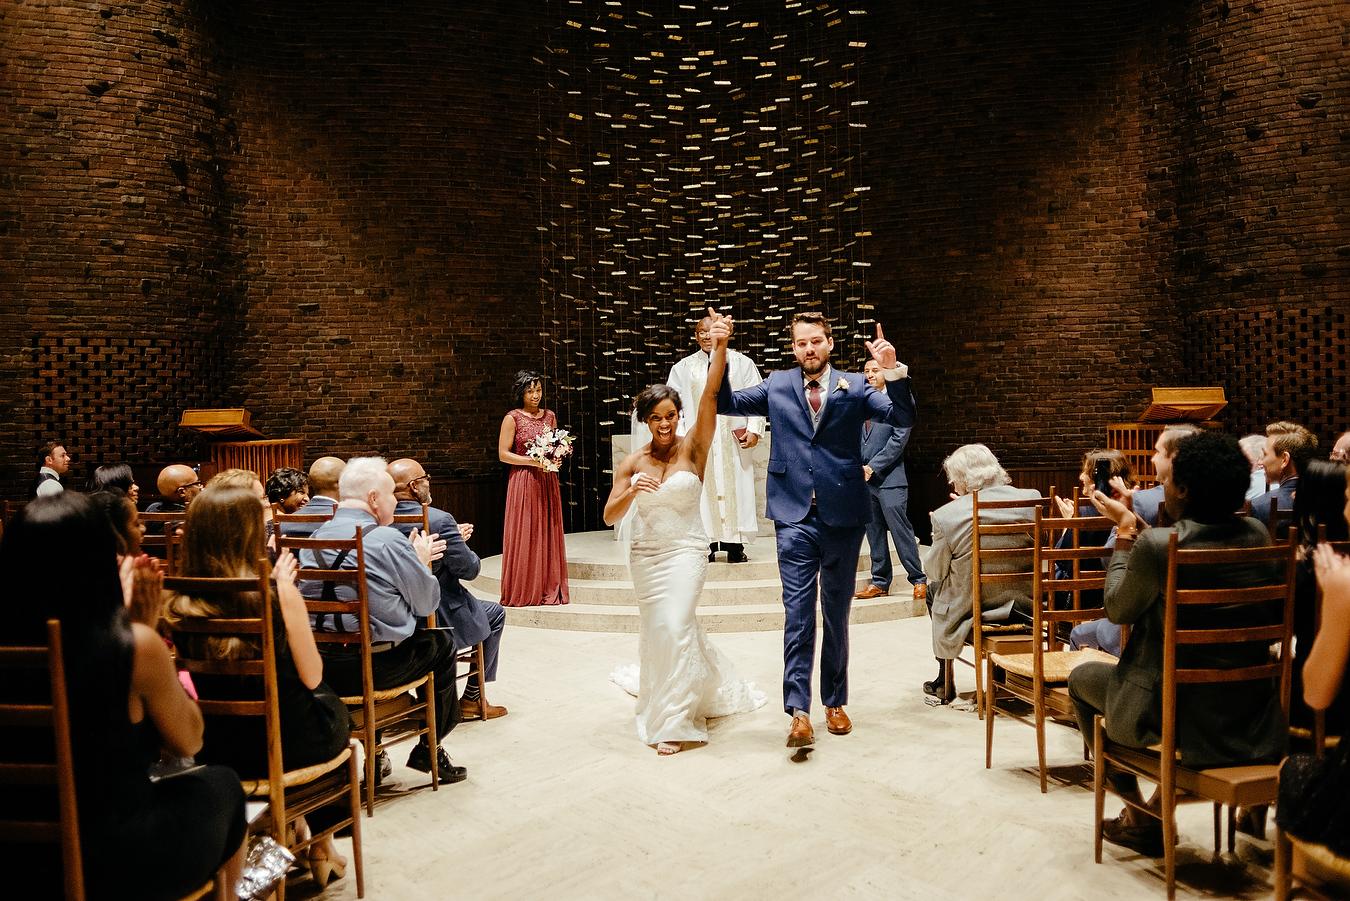 mit_chapel_cambridge_wedding_photos_50.JPG